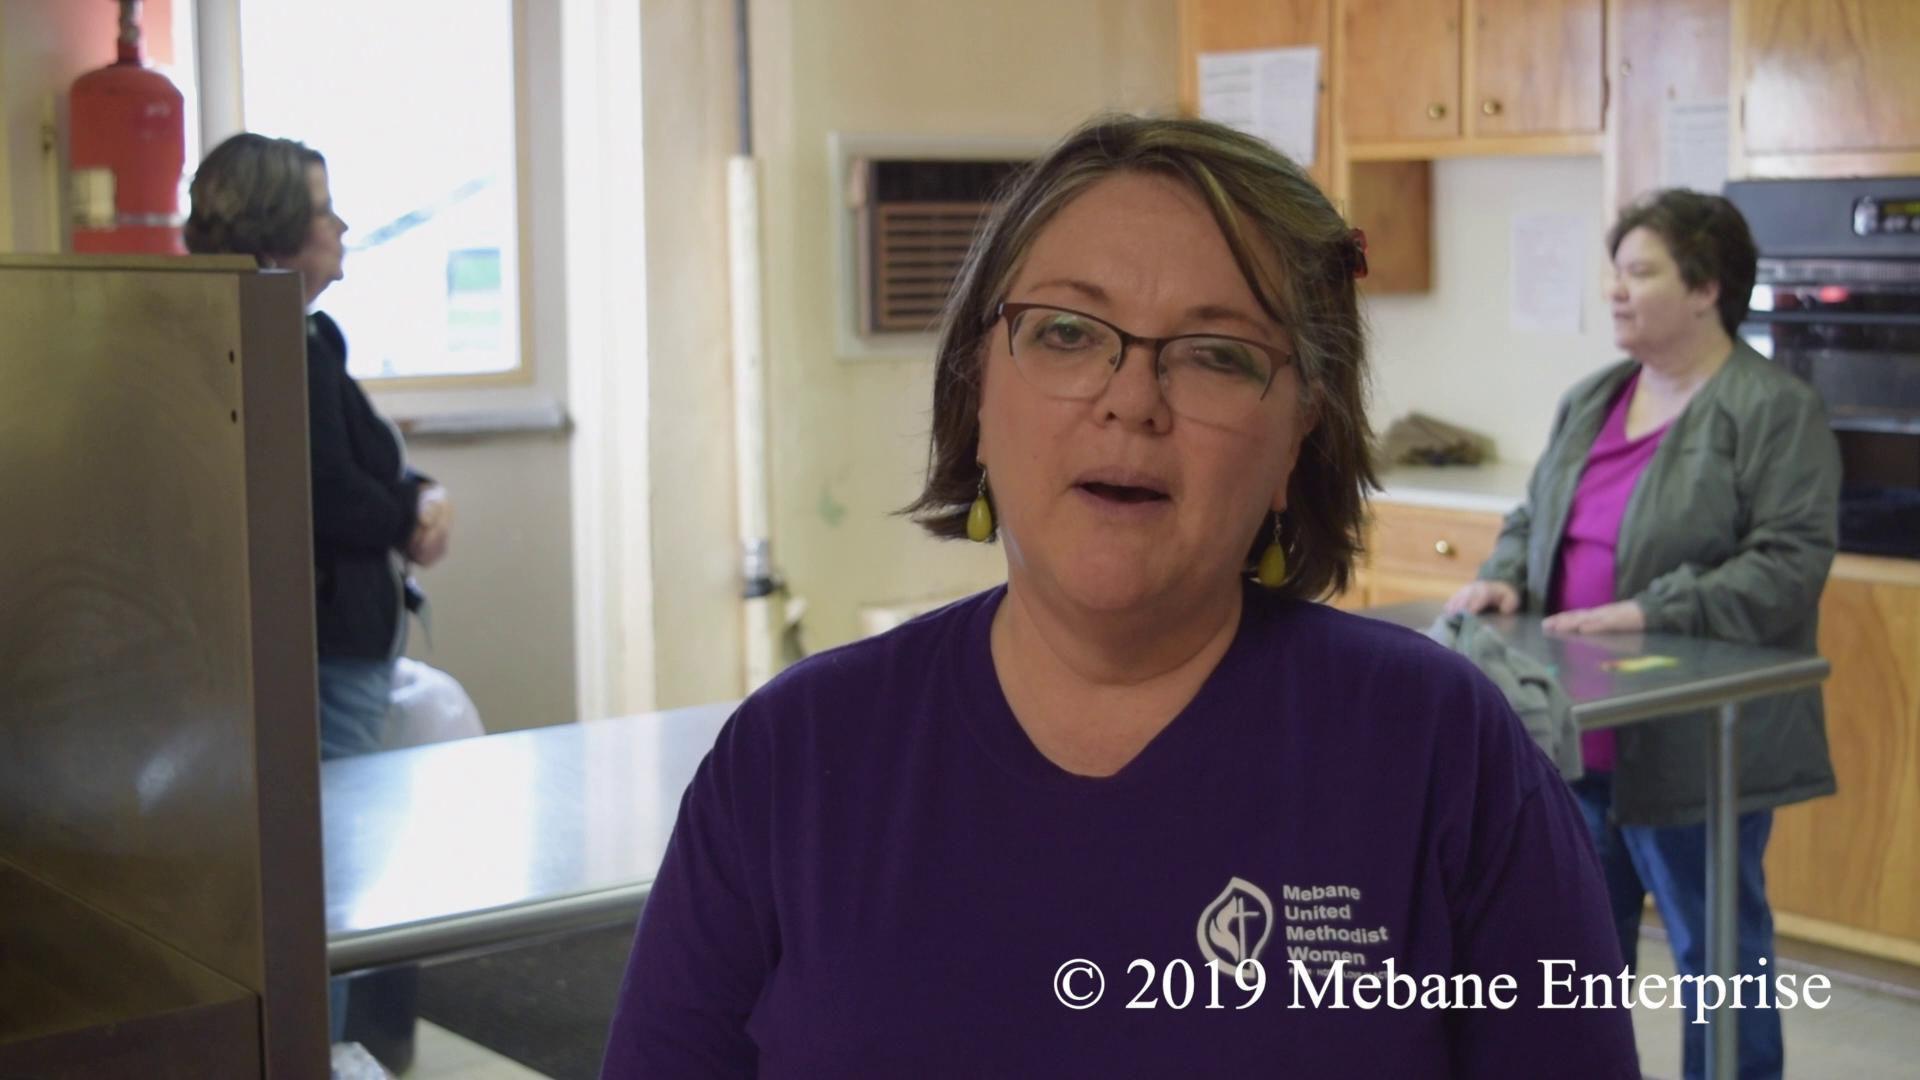 Mebane United Methodist Church Soup Ministry